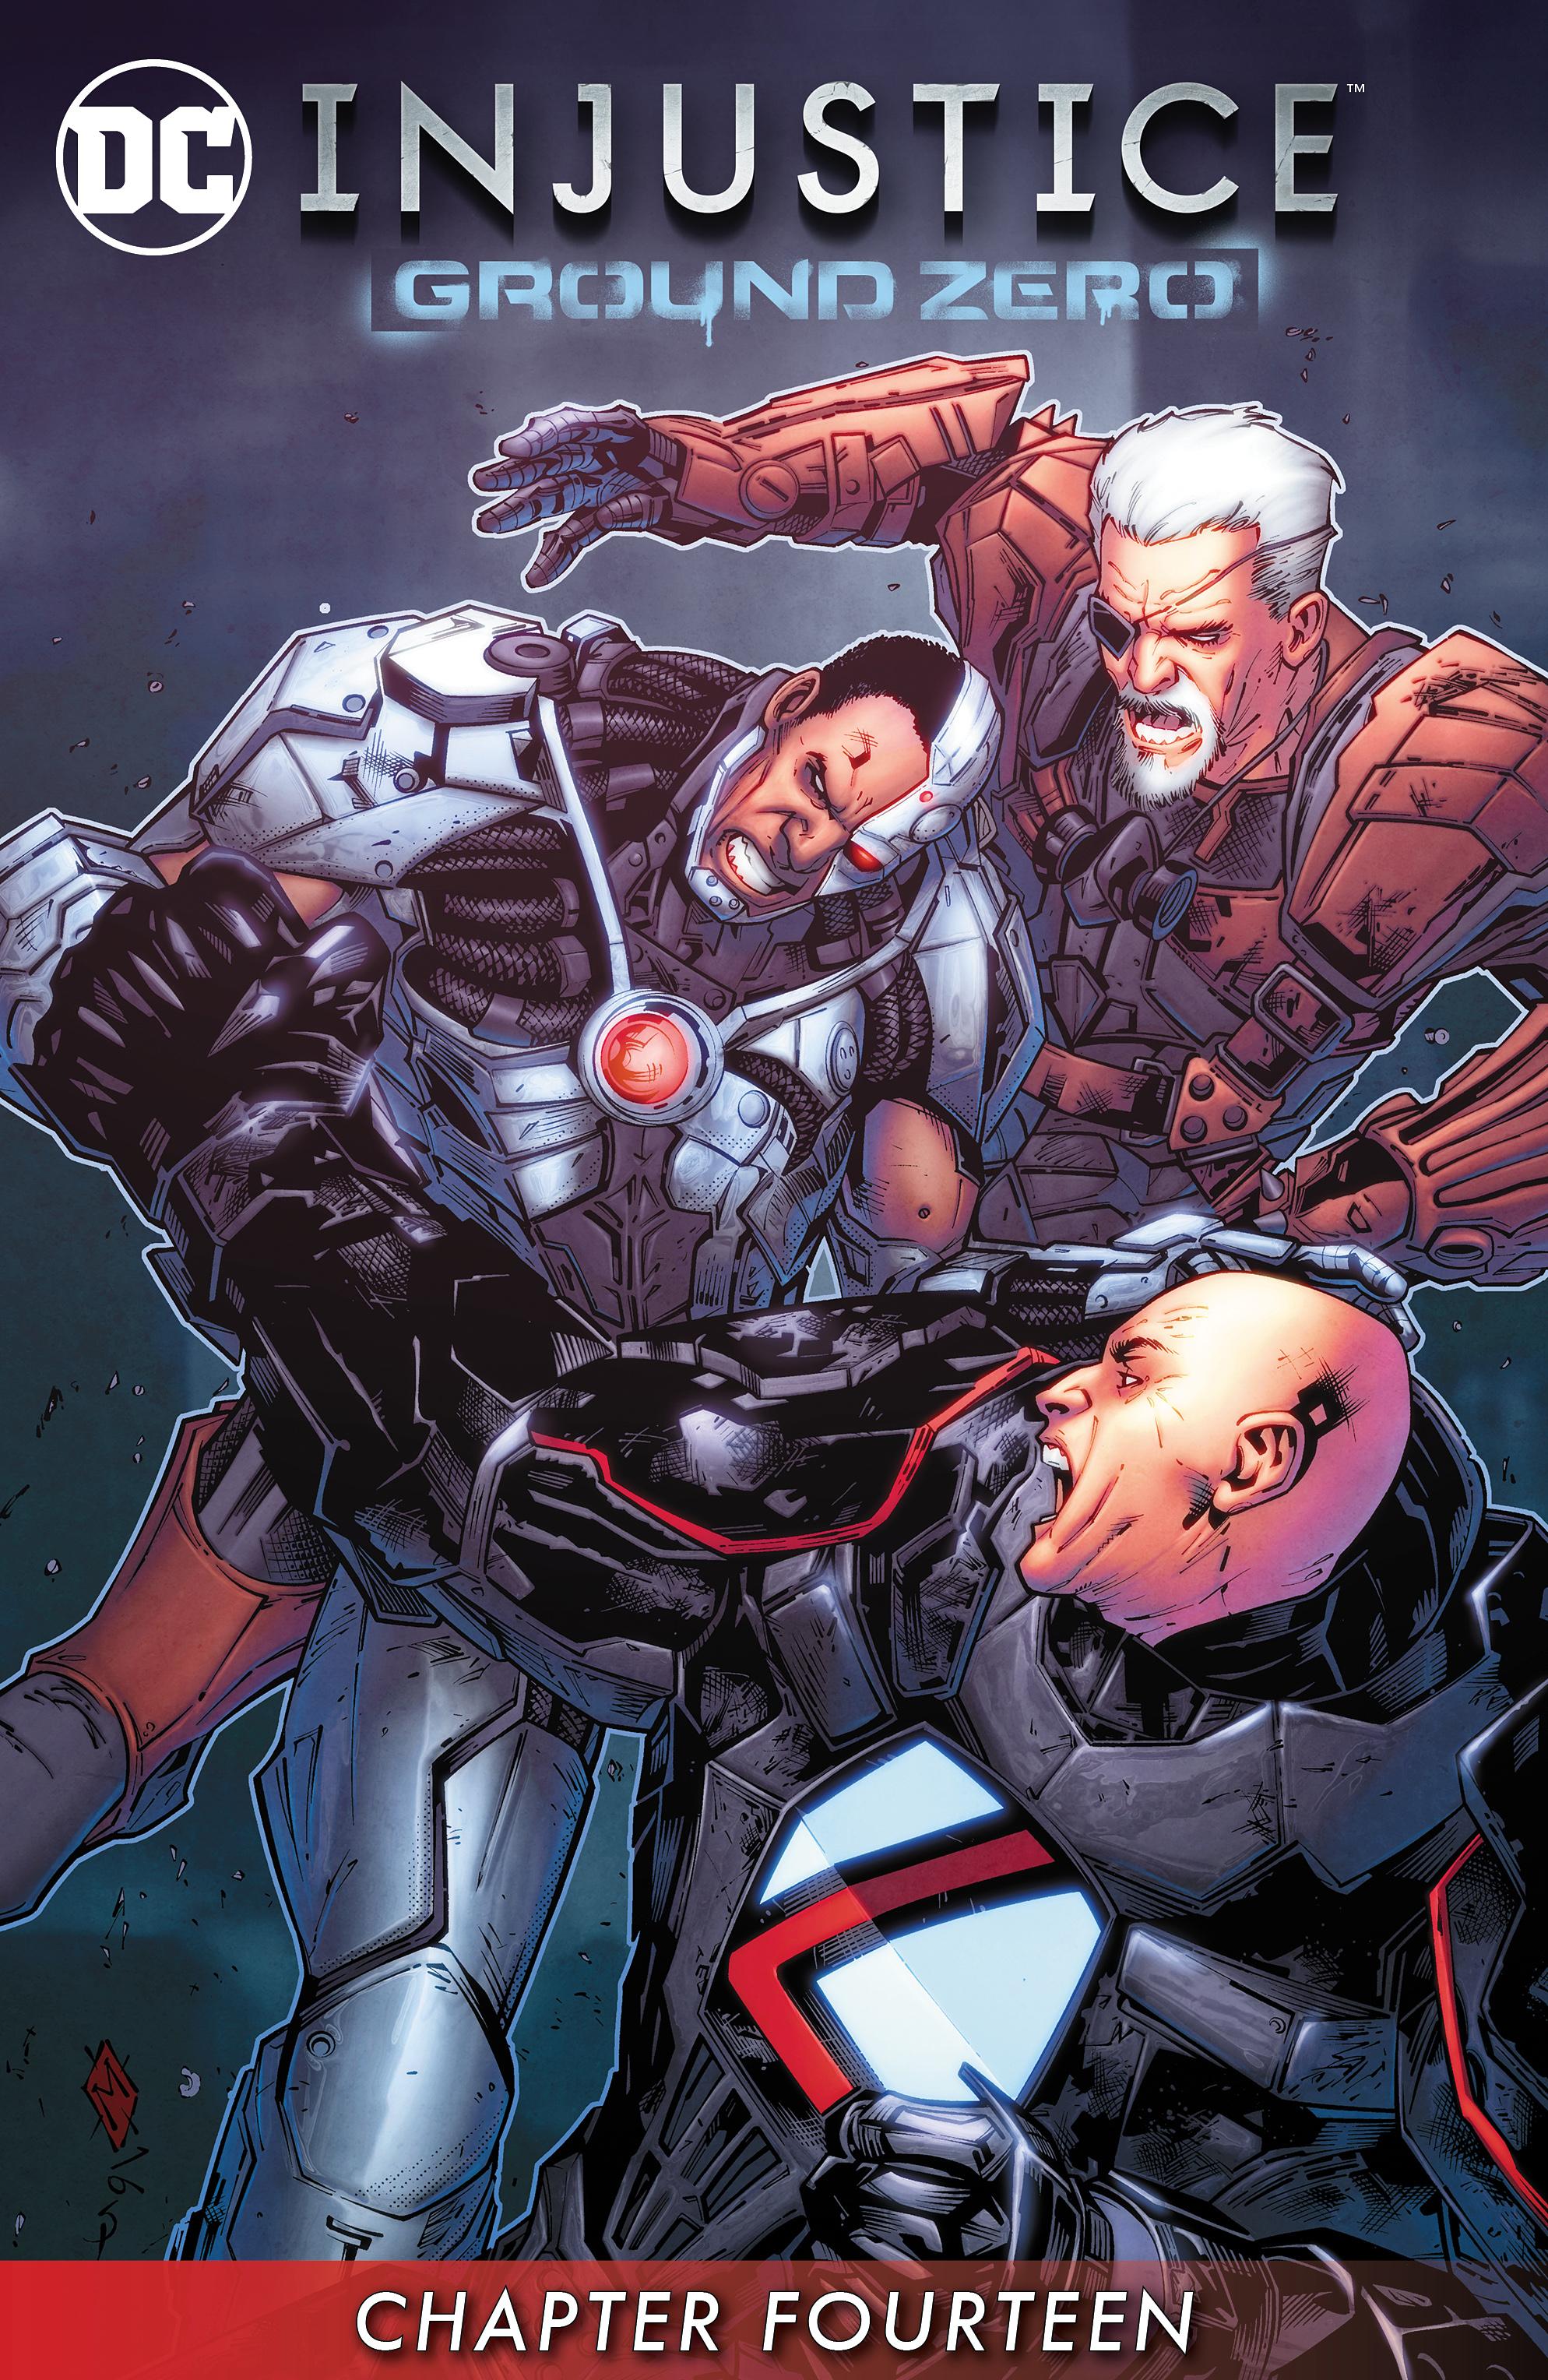 Read online Injustice: Ground Zero comic -  Issue #14 - 2